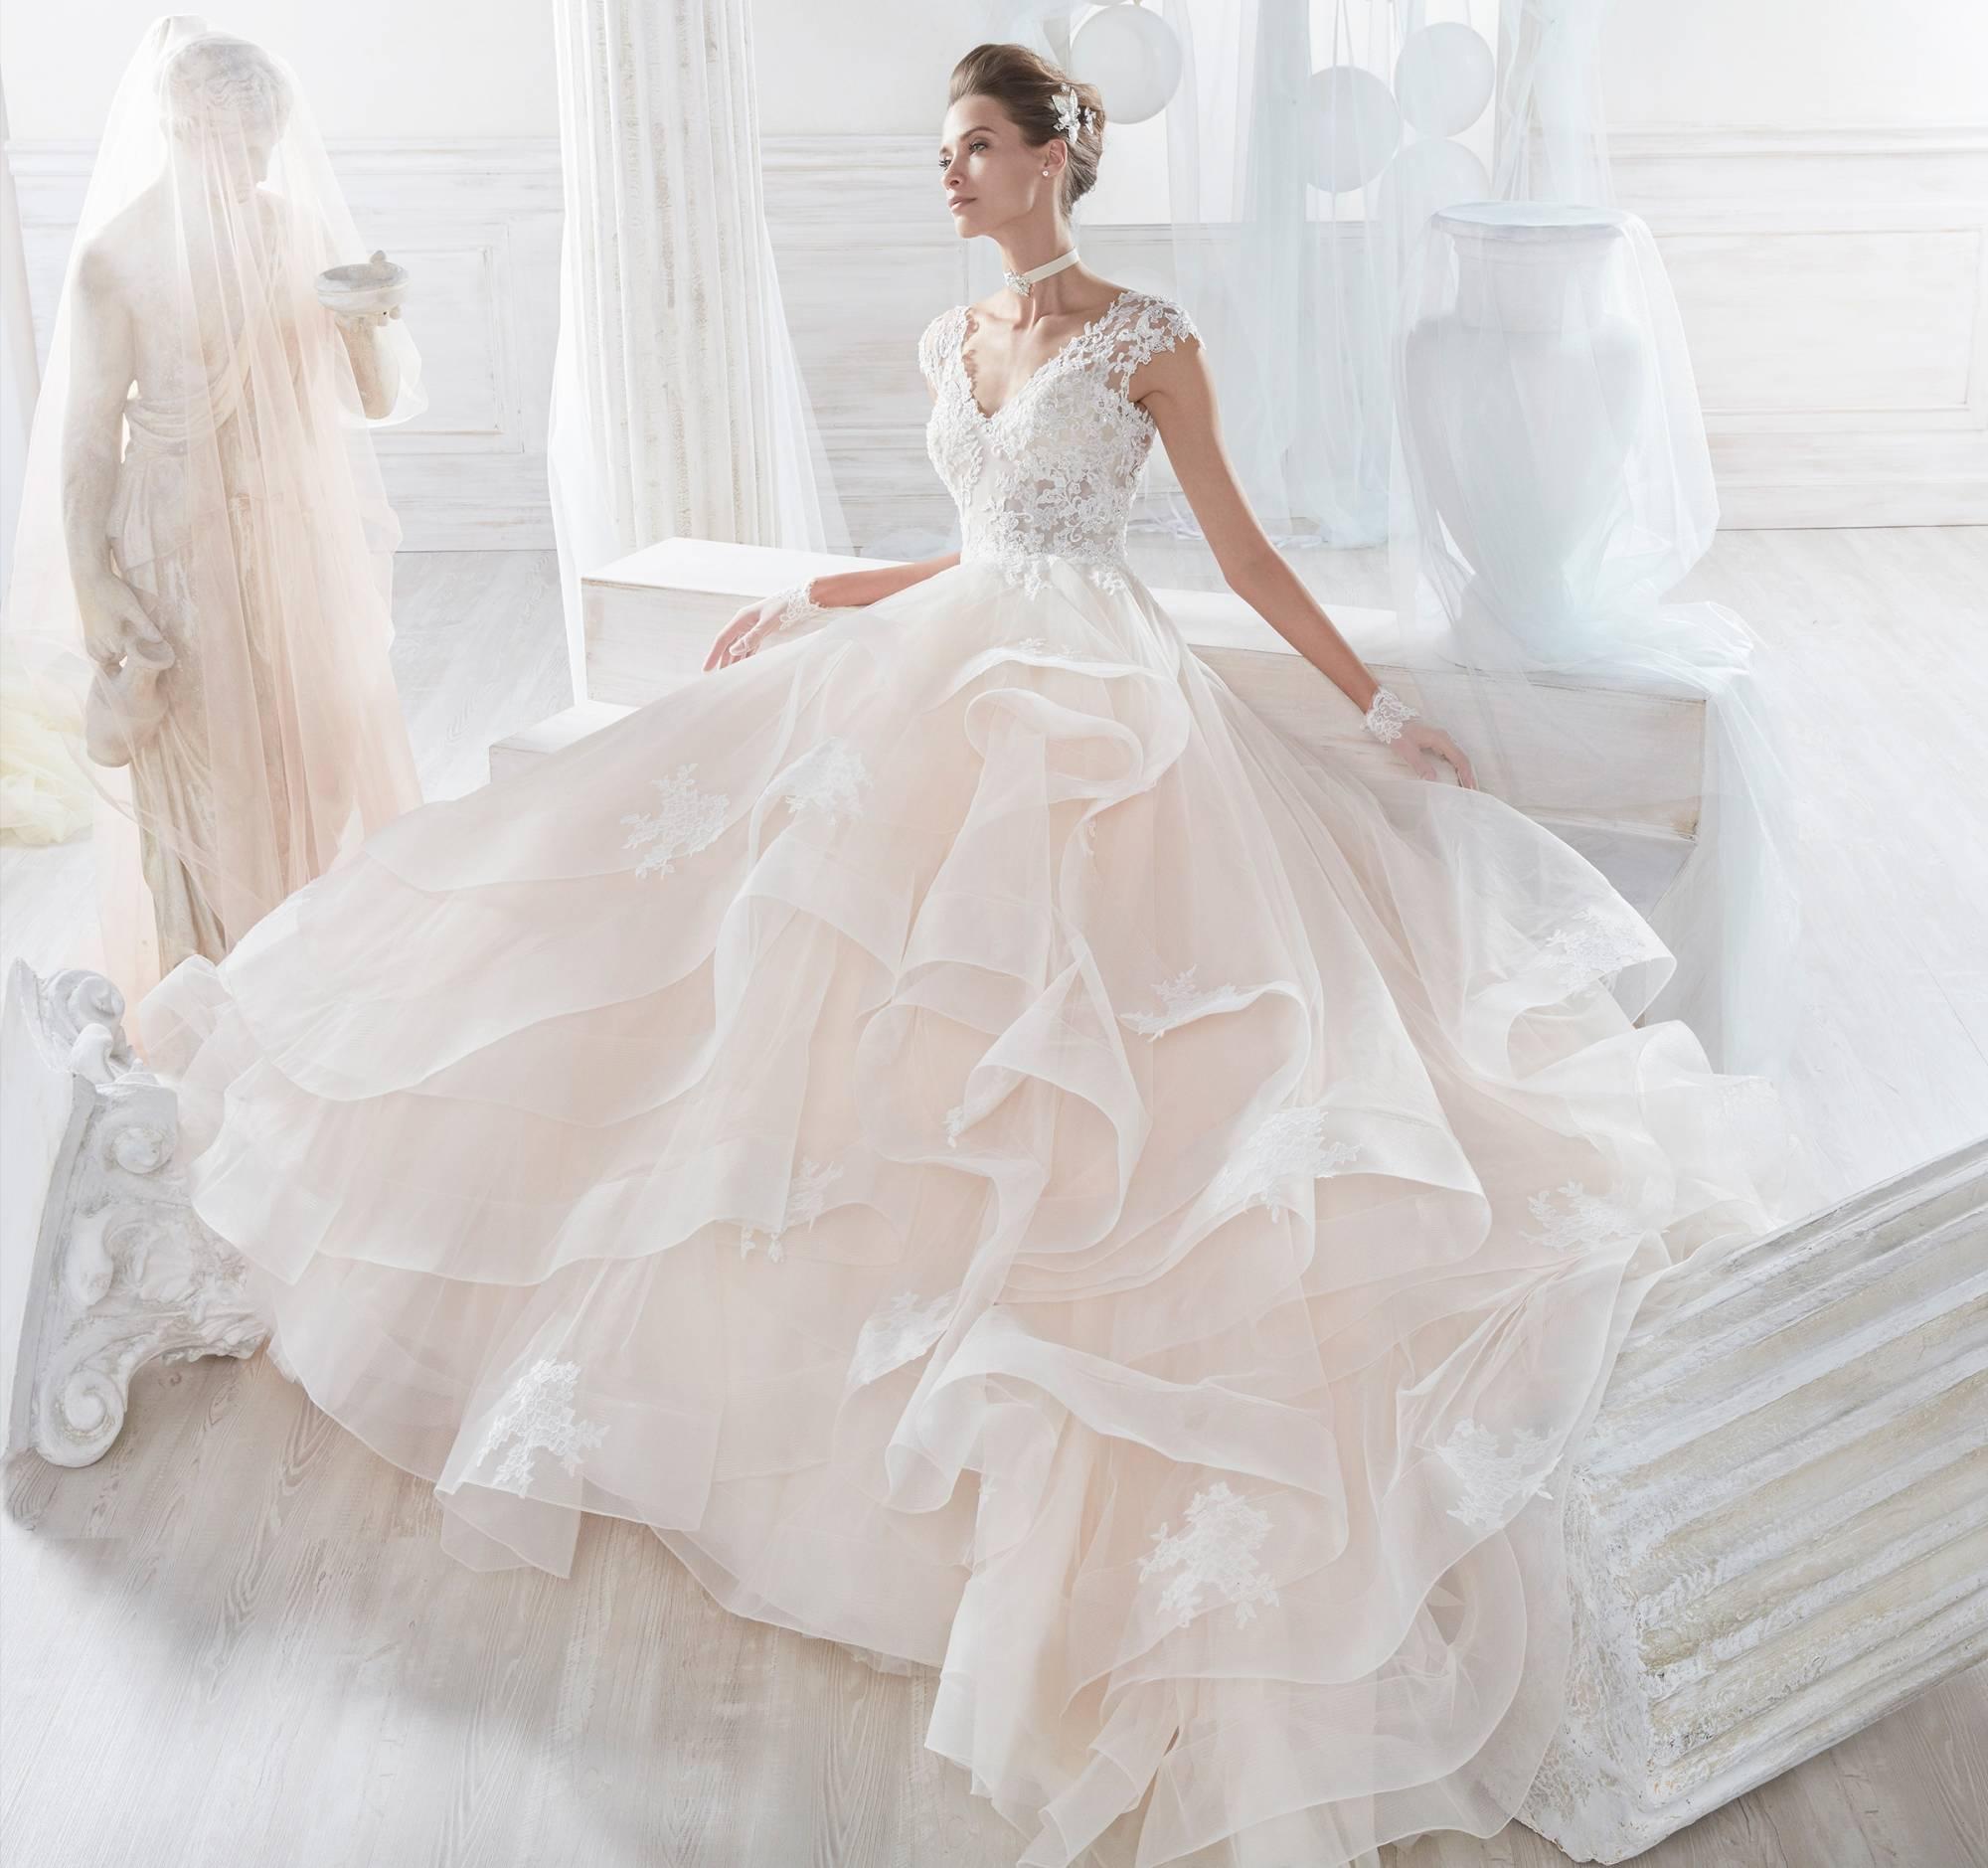 robe princesse createur romantique marseille